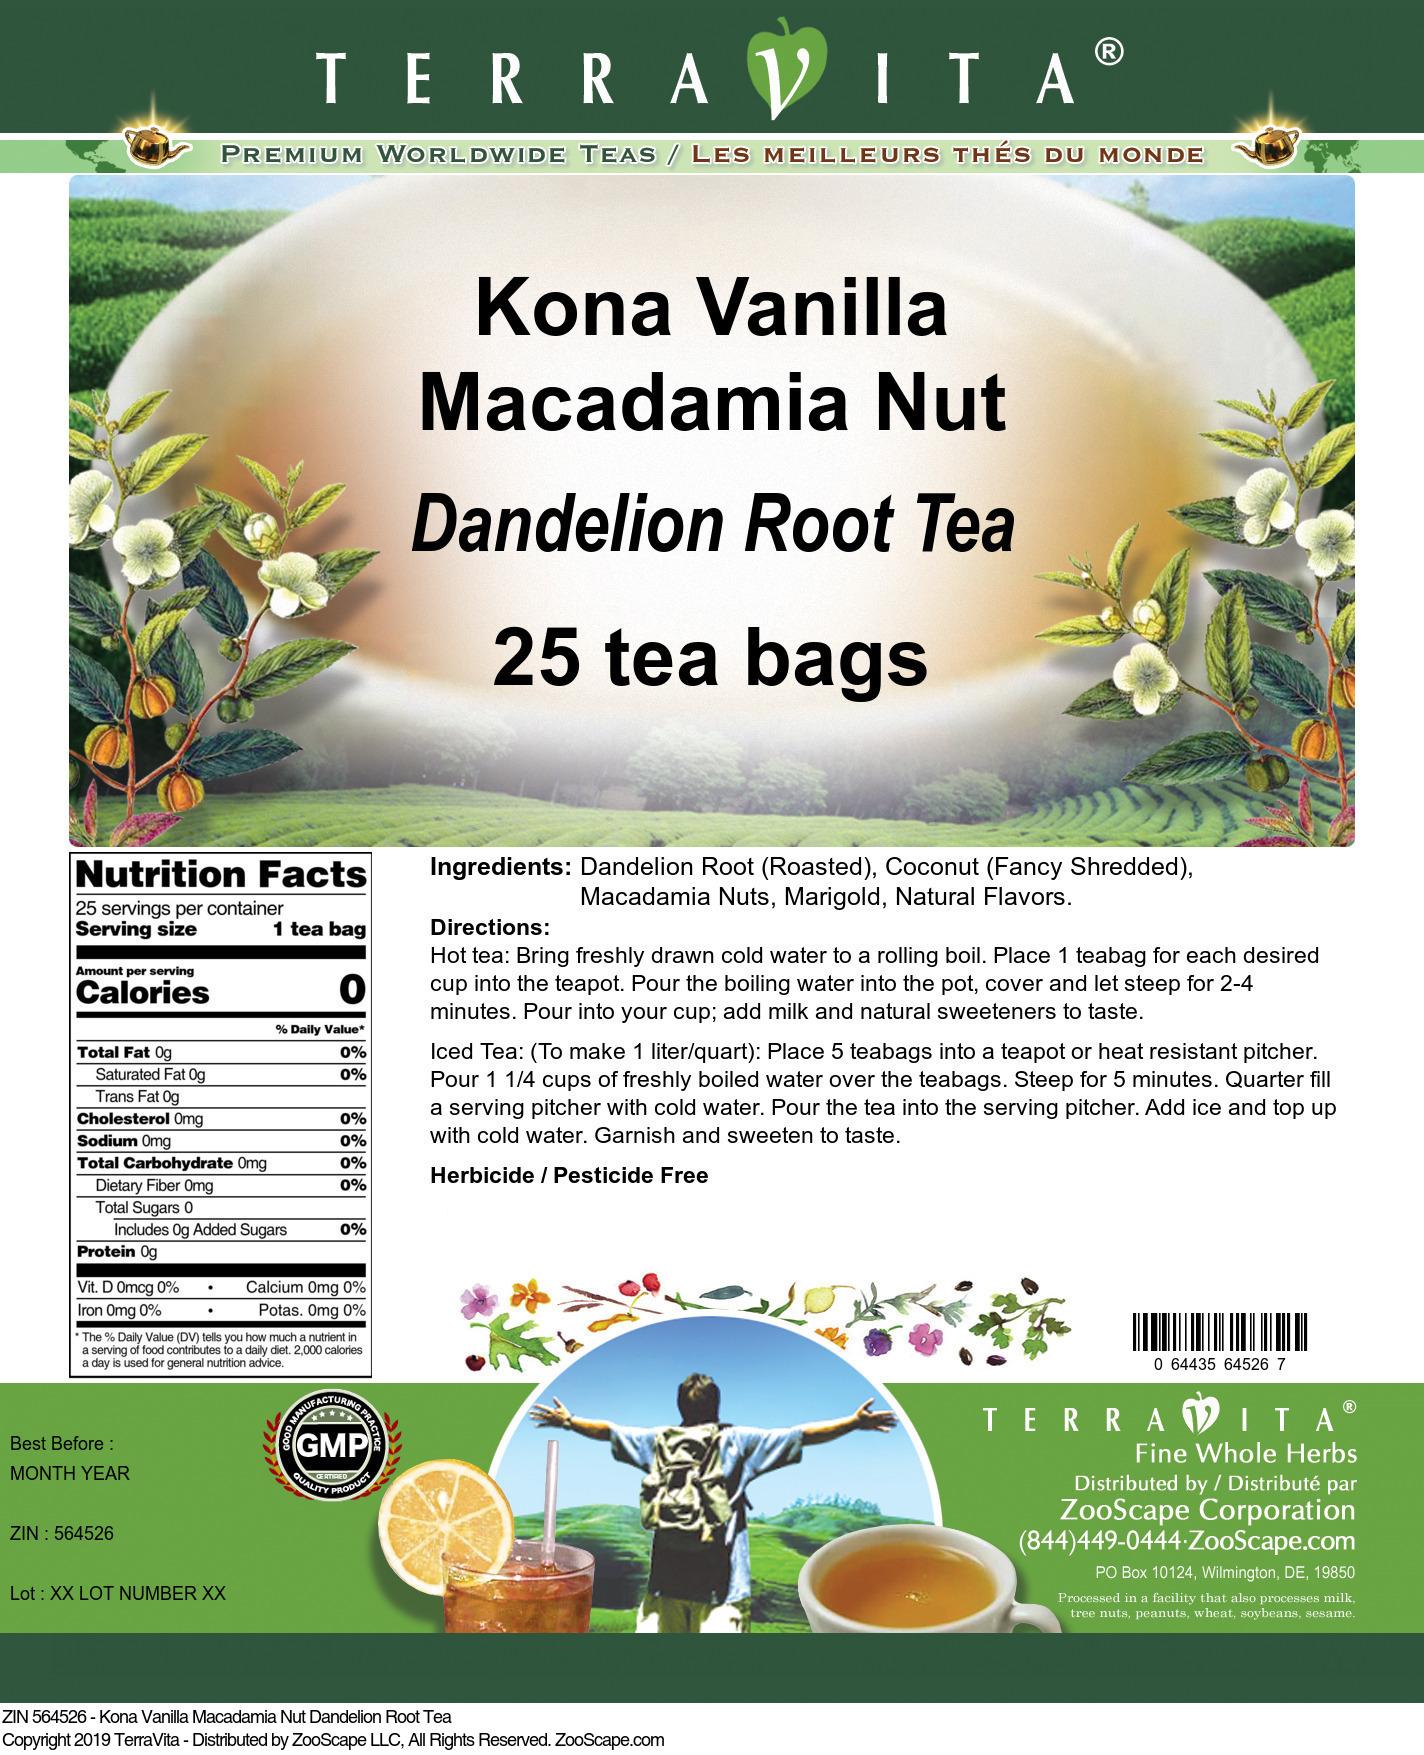 Kona Vanilla Macadamia Nut Dandelion Root Tea